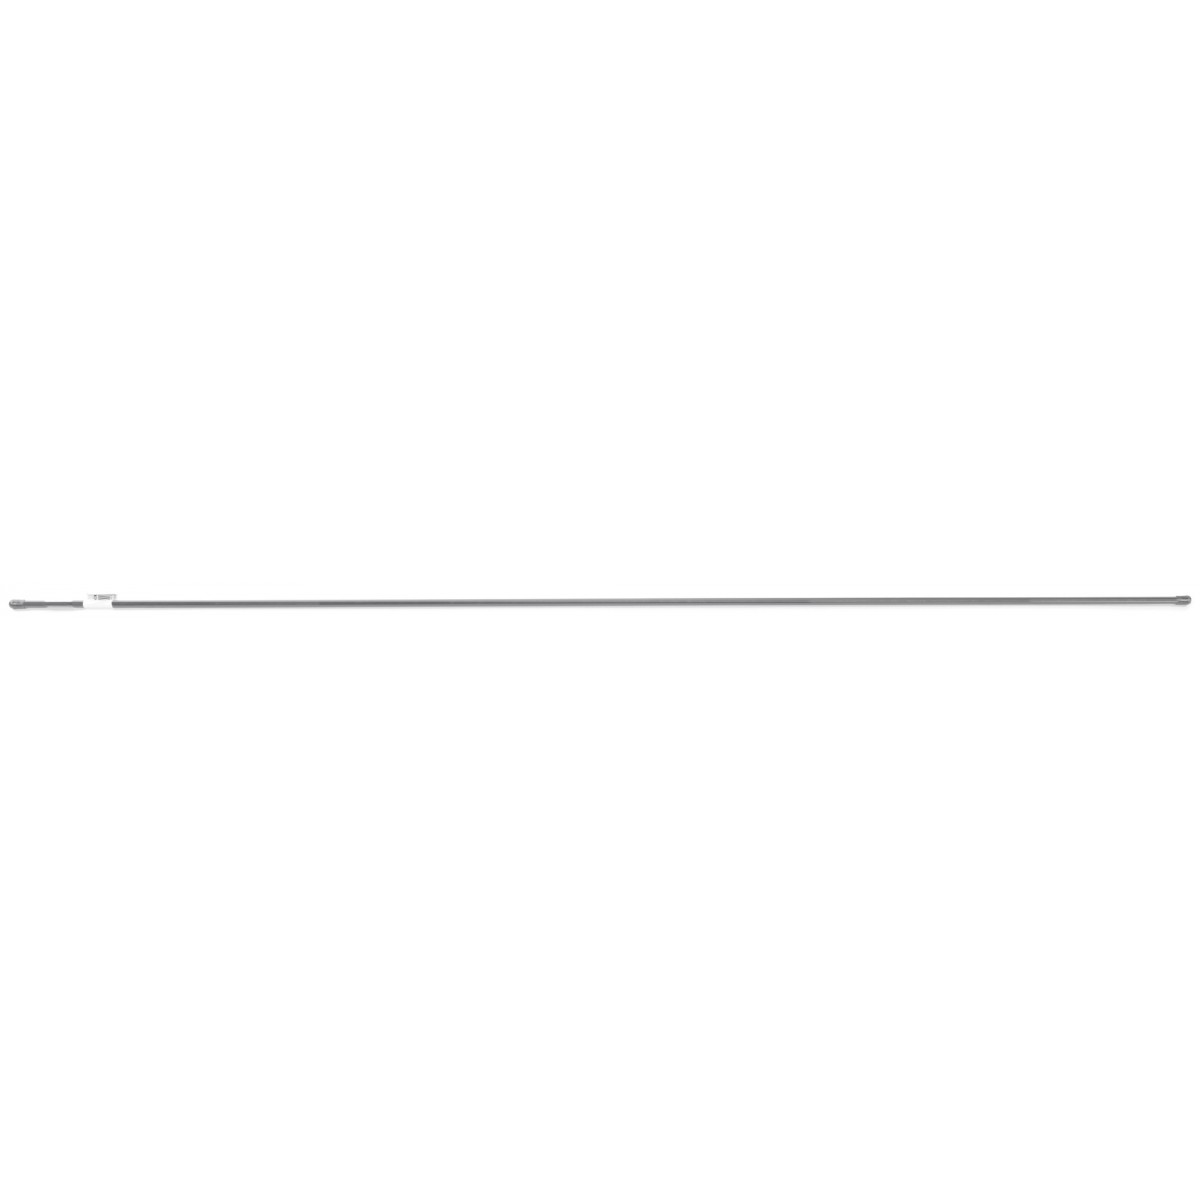 barre de tension galvanis e filiac hauteur 1 25 m diam tre 8 mm de barre de tension. Black Bedroom Furniture Sets. Home Design Ideas